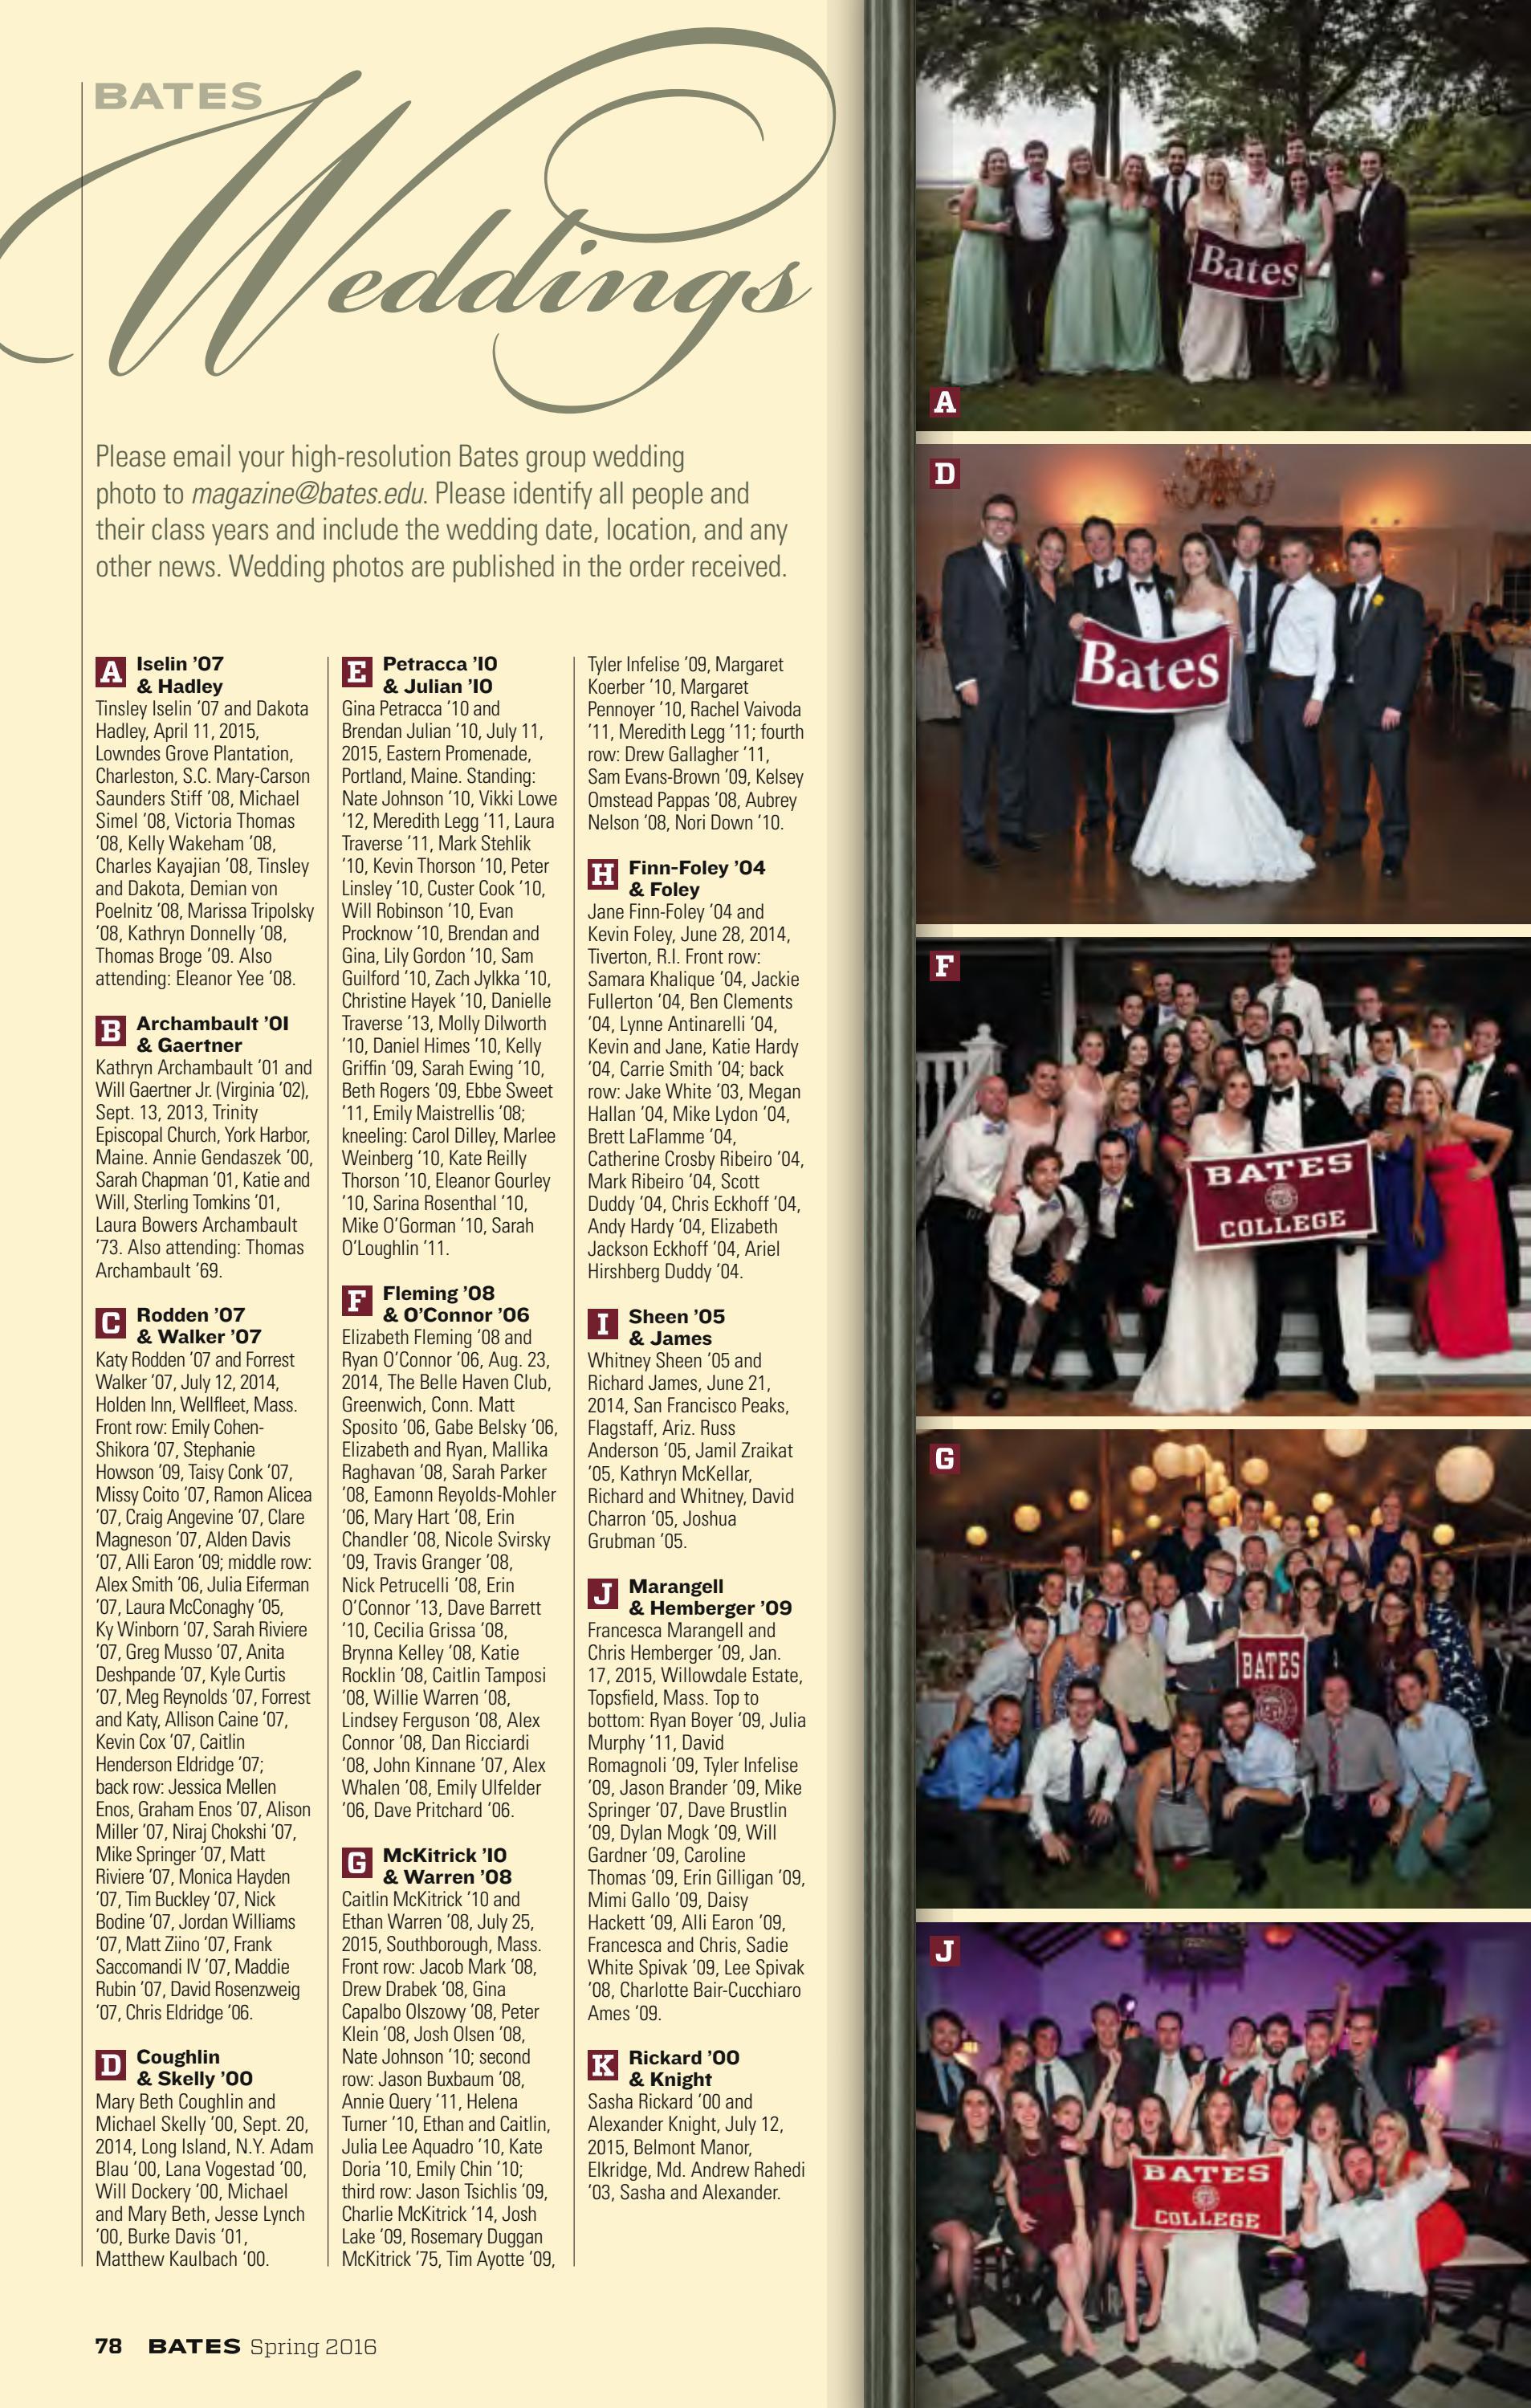 Bates magazine, Spring 2016 by Bates College - issuu